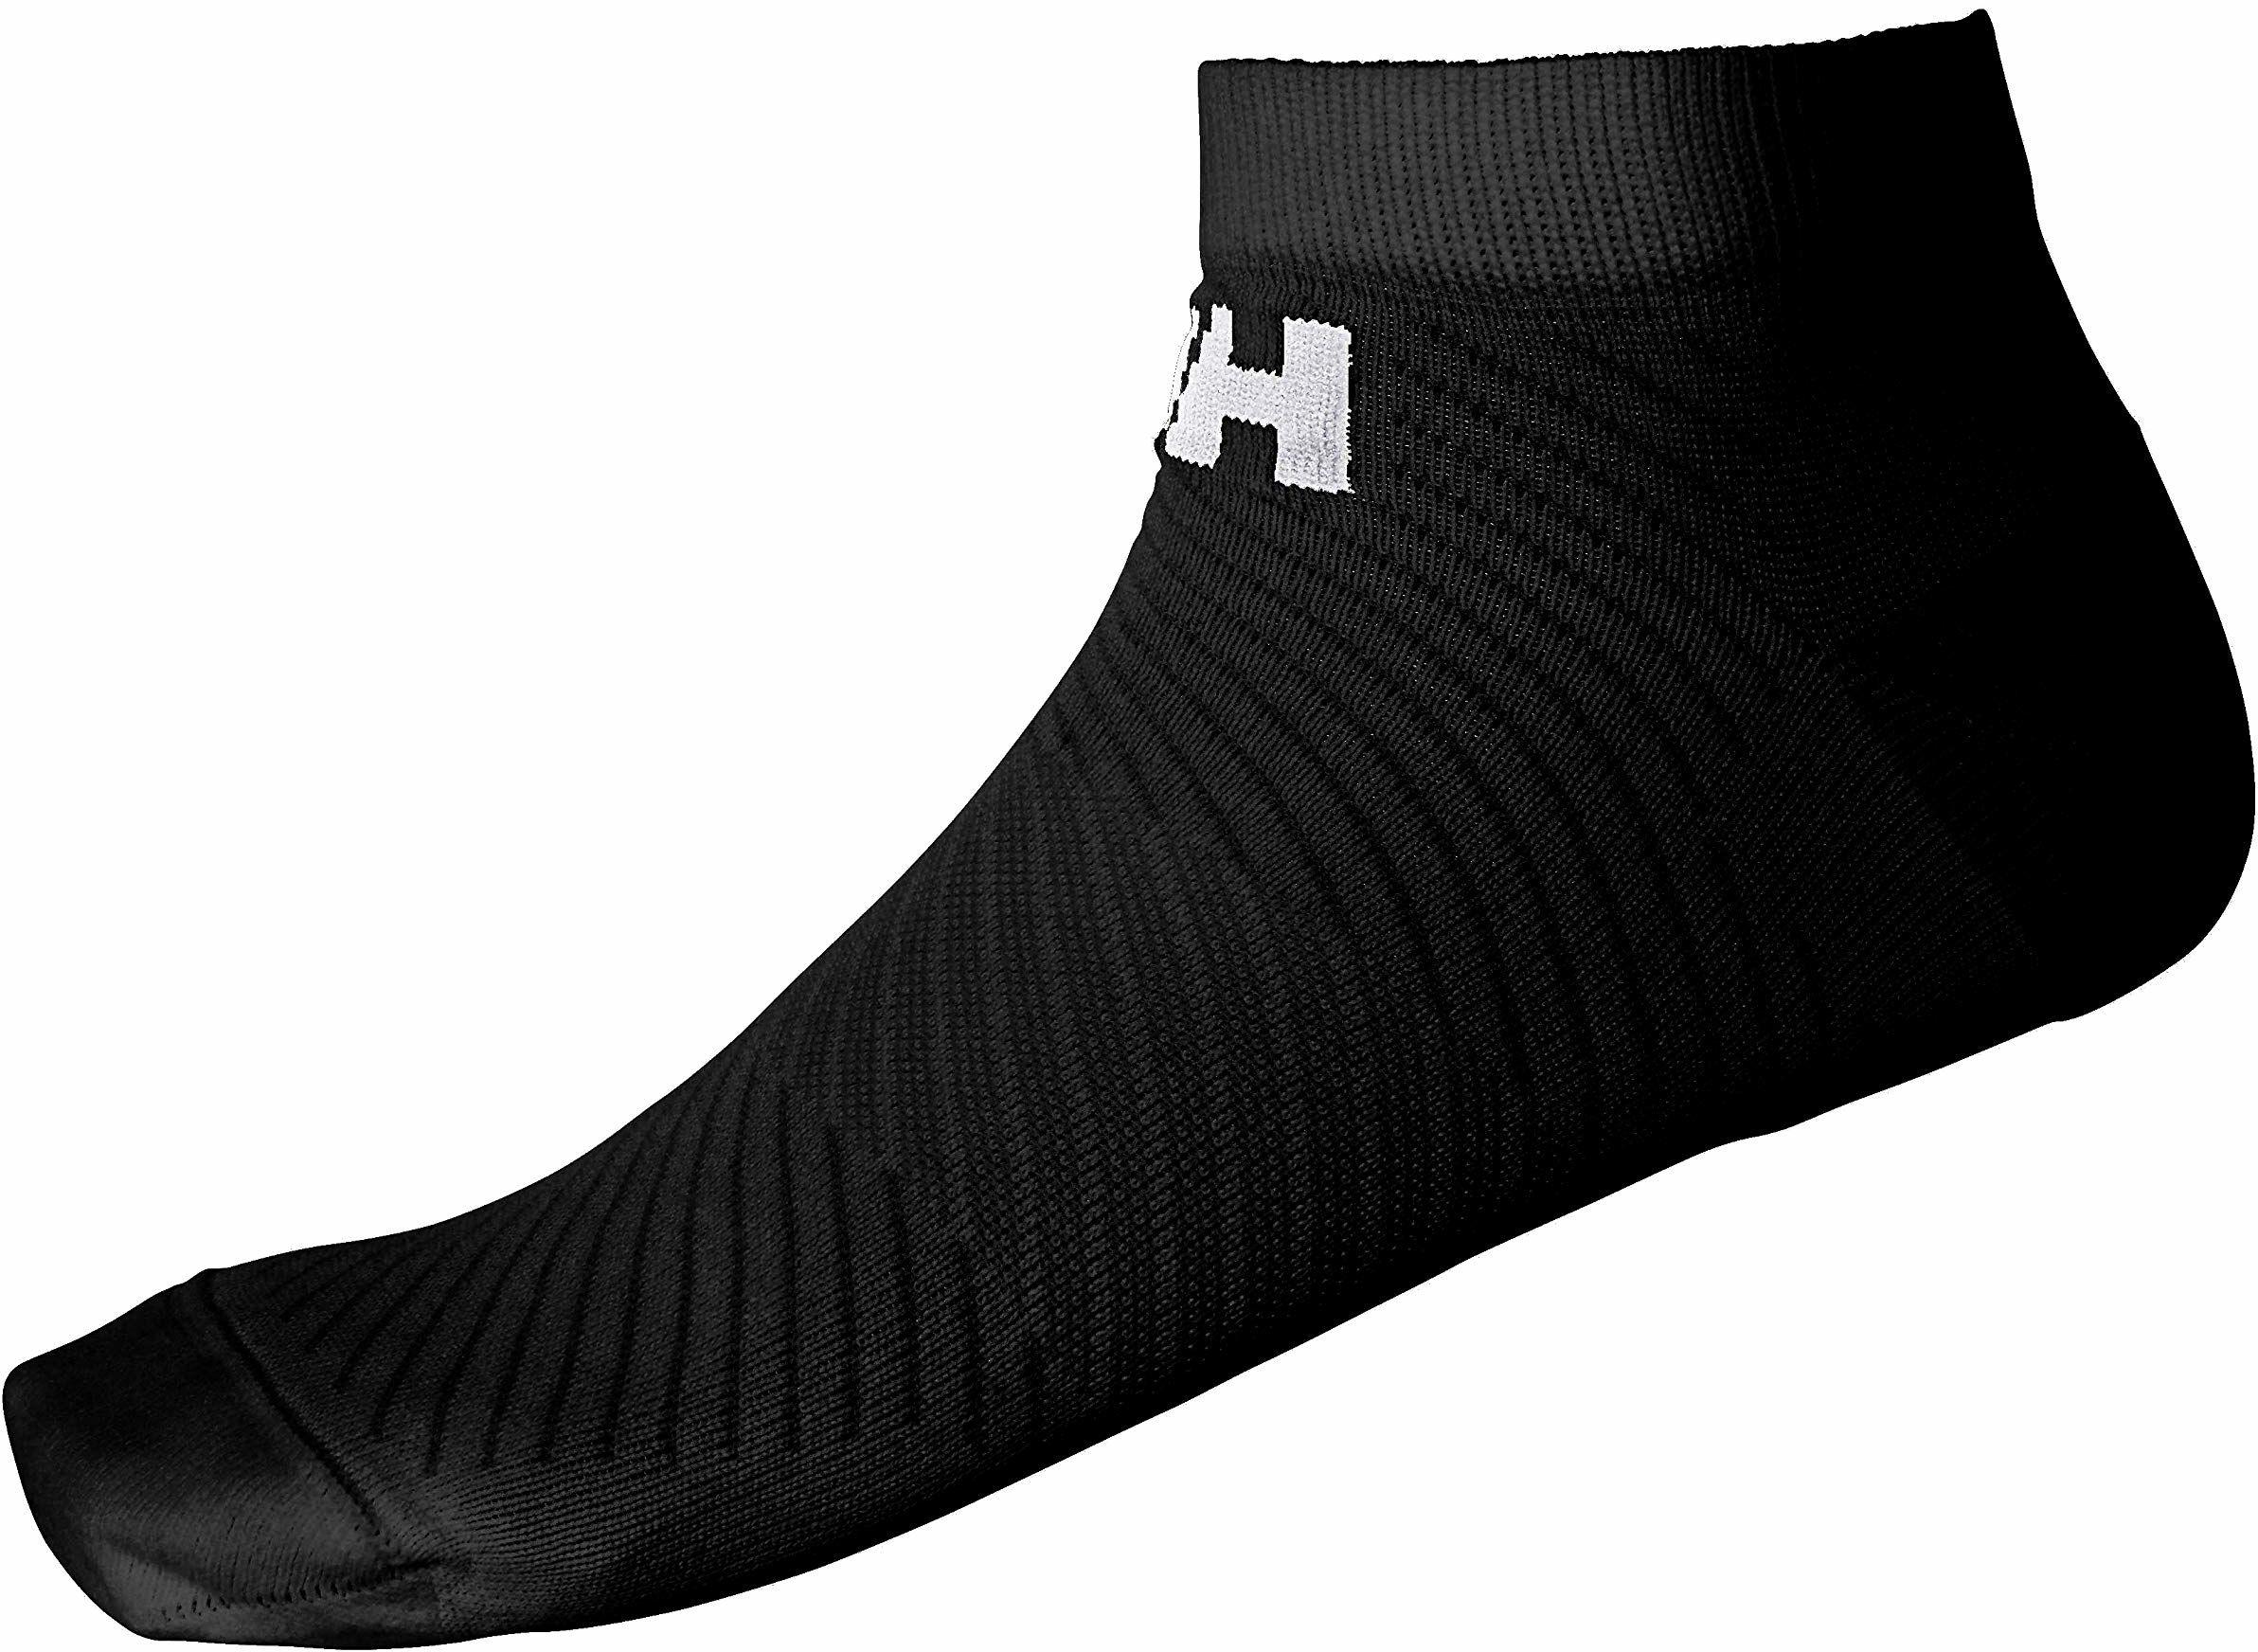 Helly Hansen Active Sport skarpety uniseks, czarny/czarny, 36-38